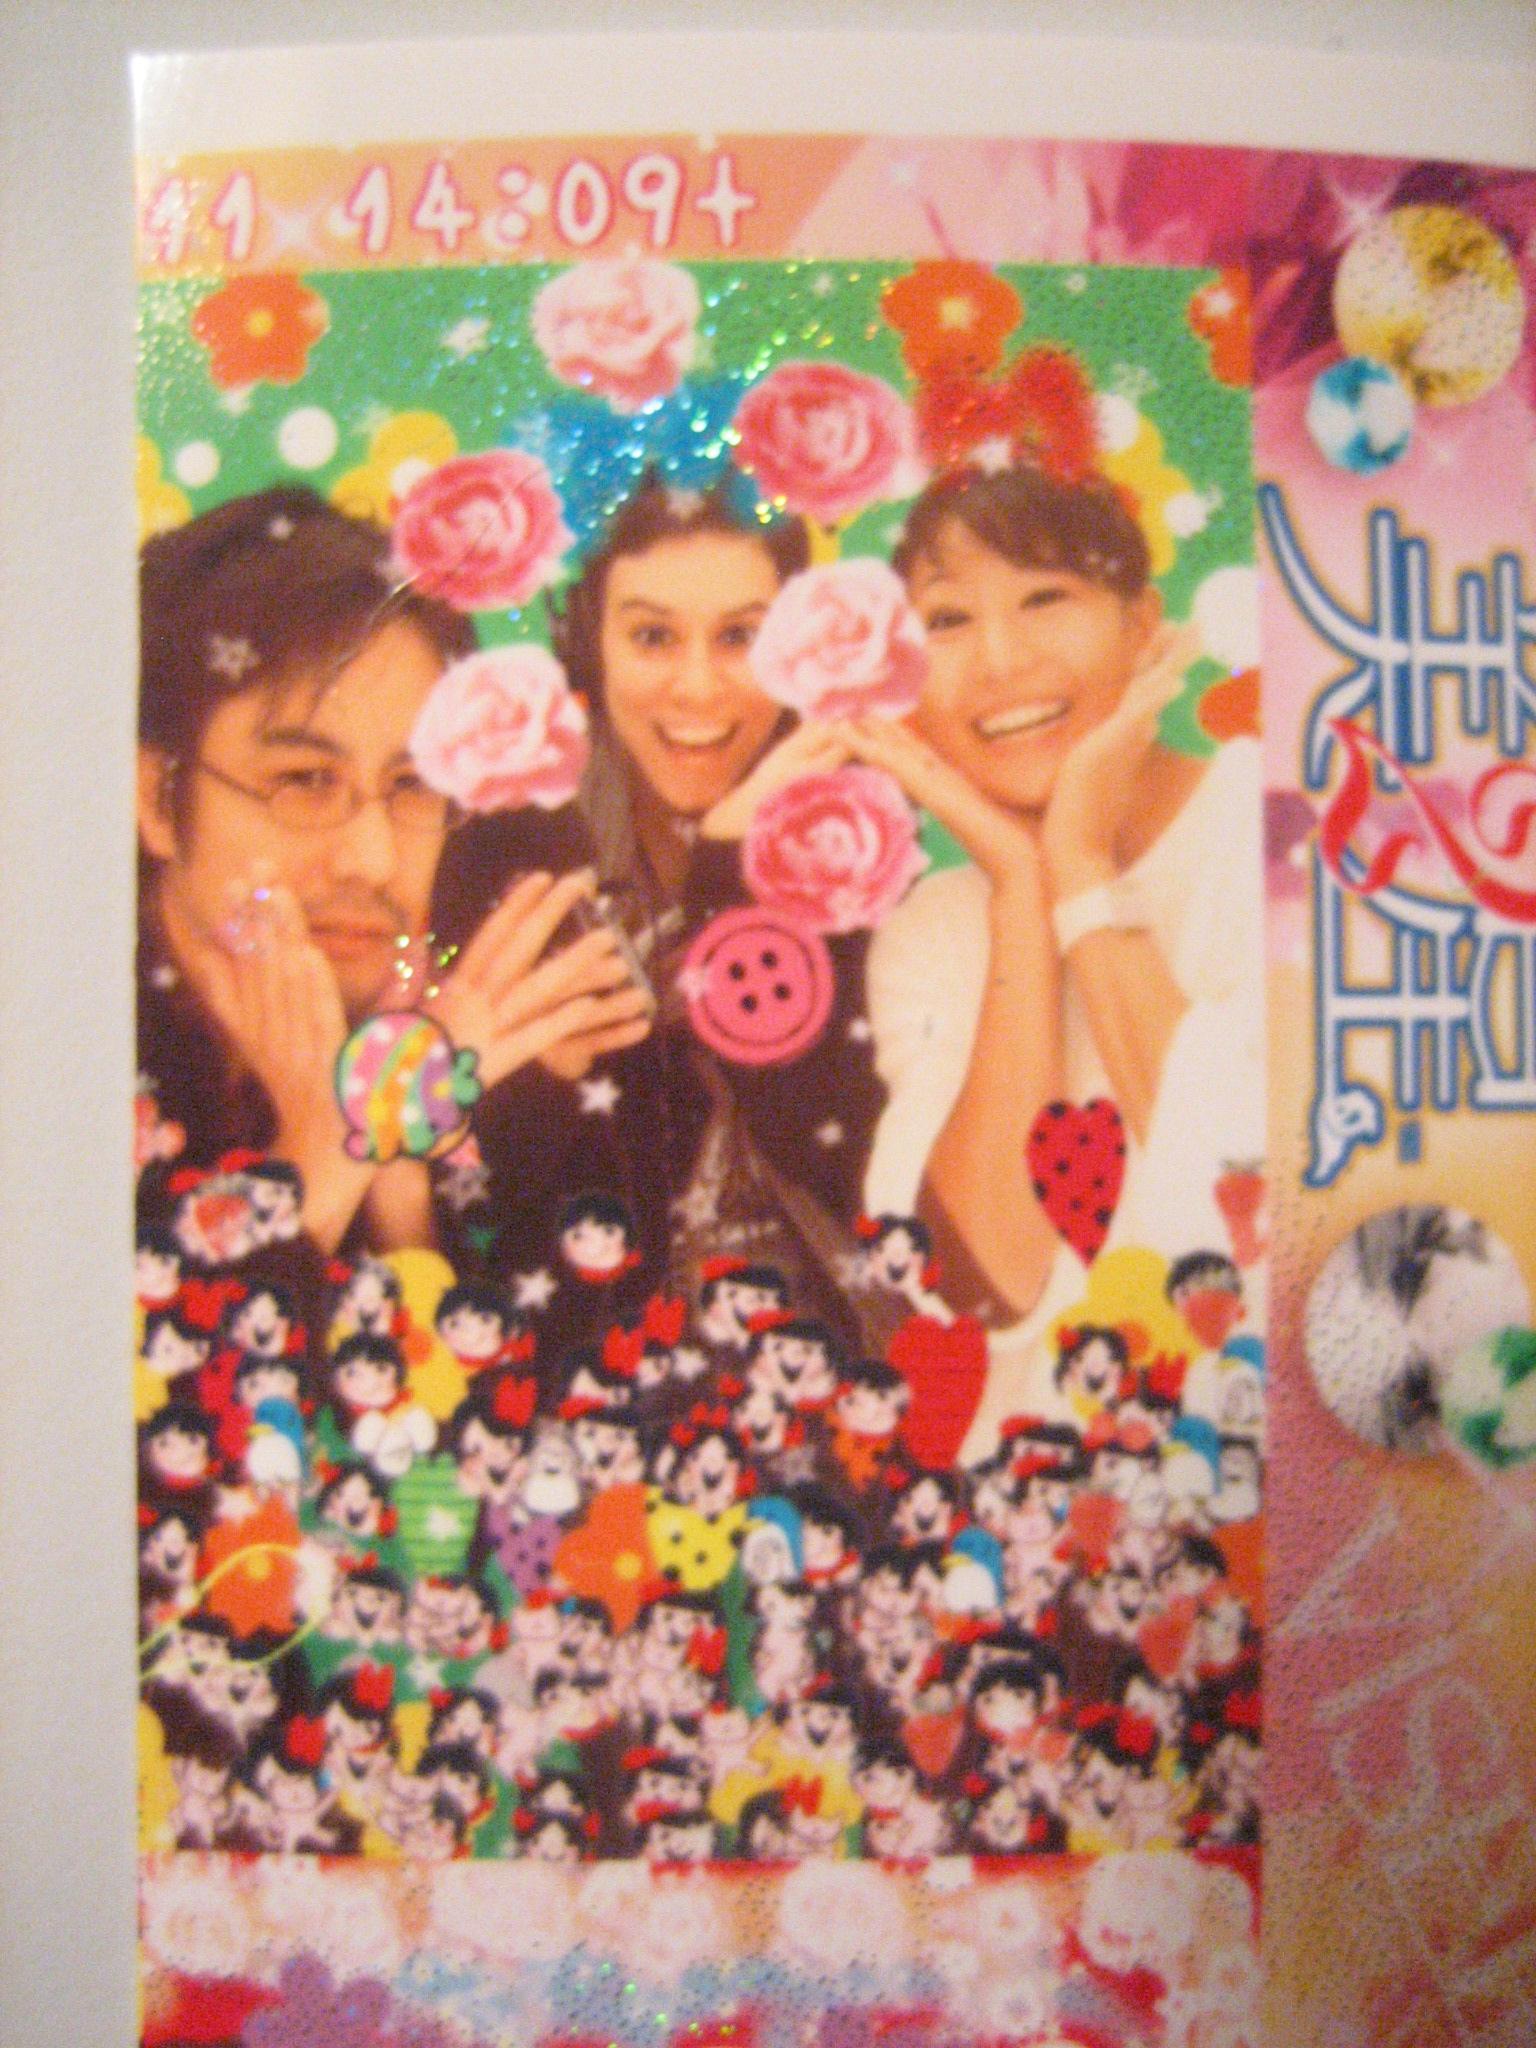 Daisuke, Leital and Lisa in Glorious Glitter